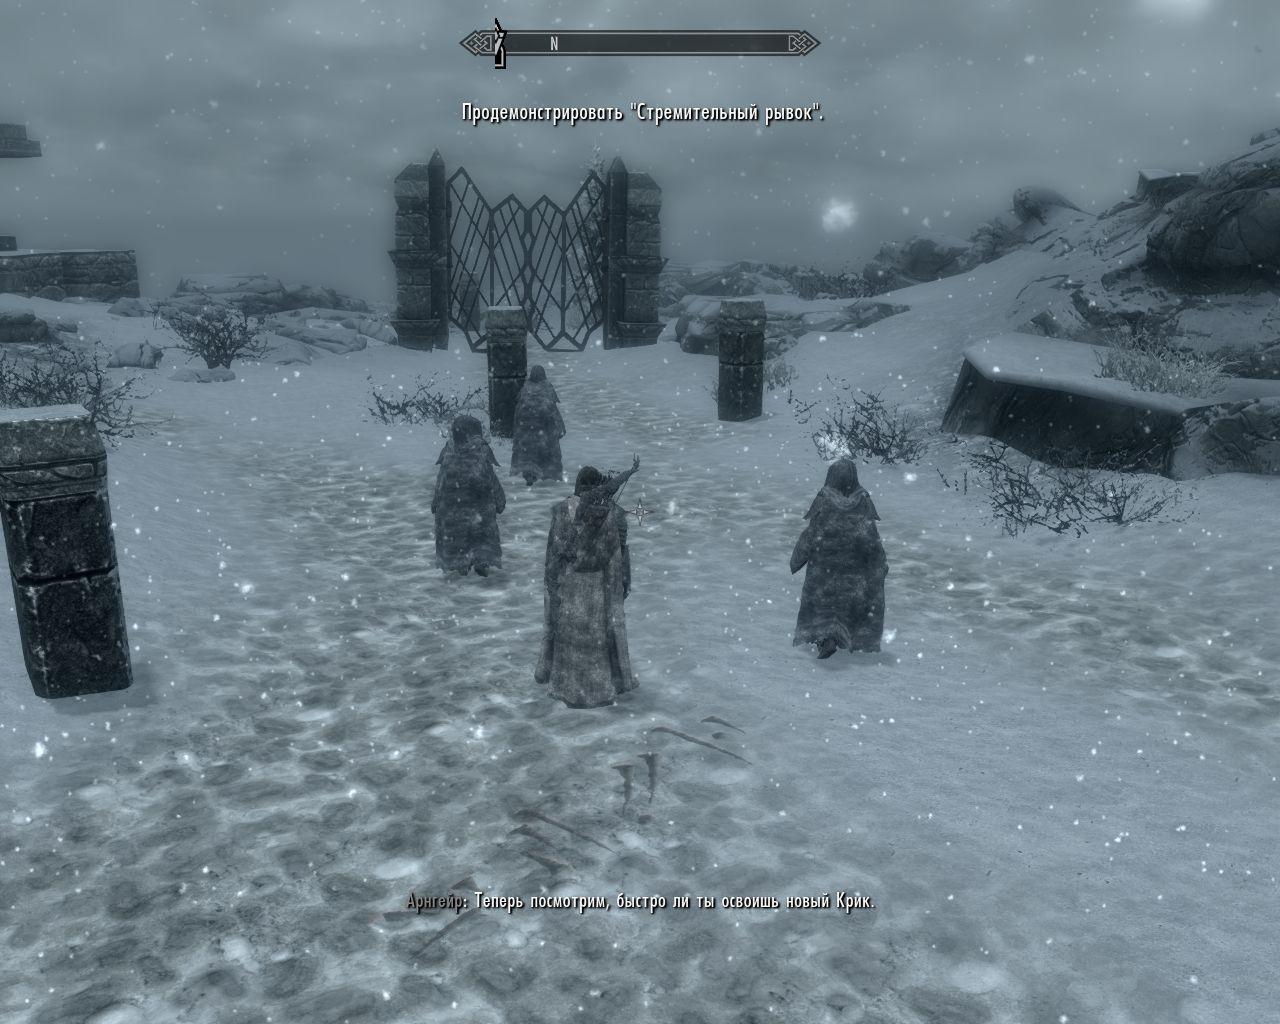 enb2013_1_19_17_18_37.jpg - Elder Scrolls 5: Skyrim, the